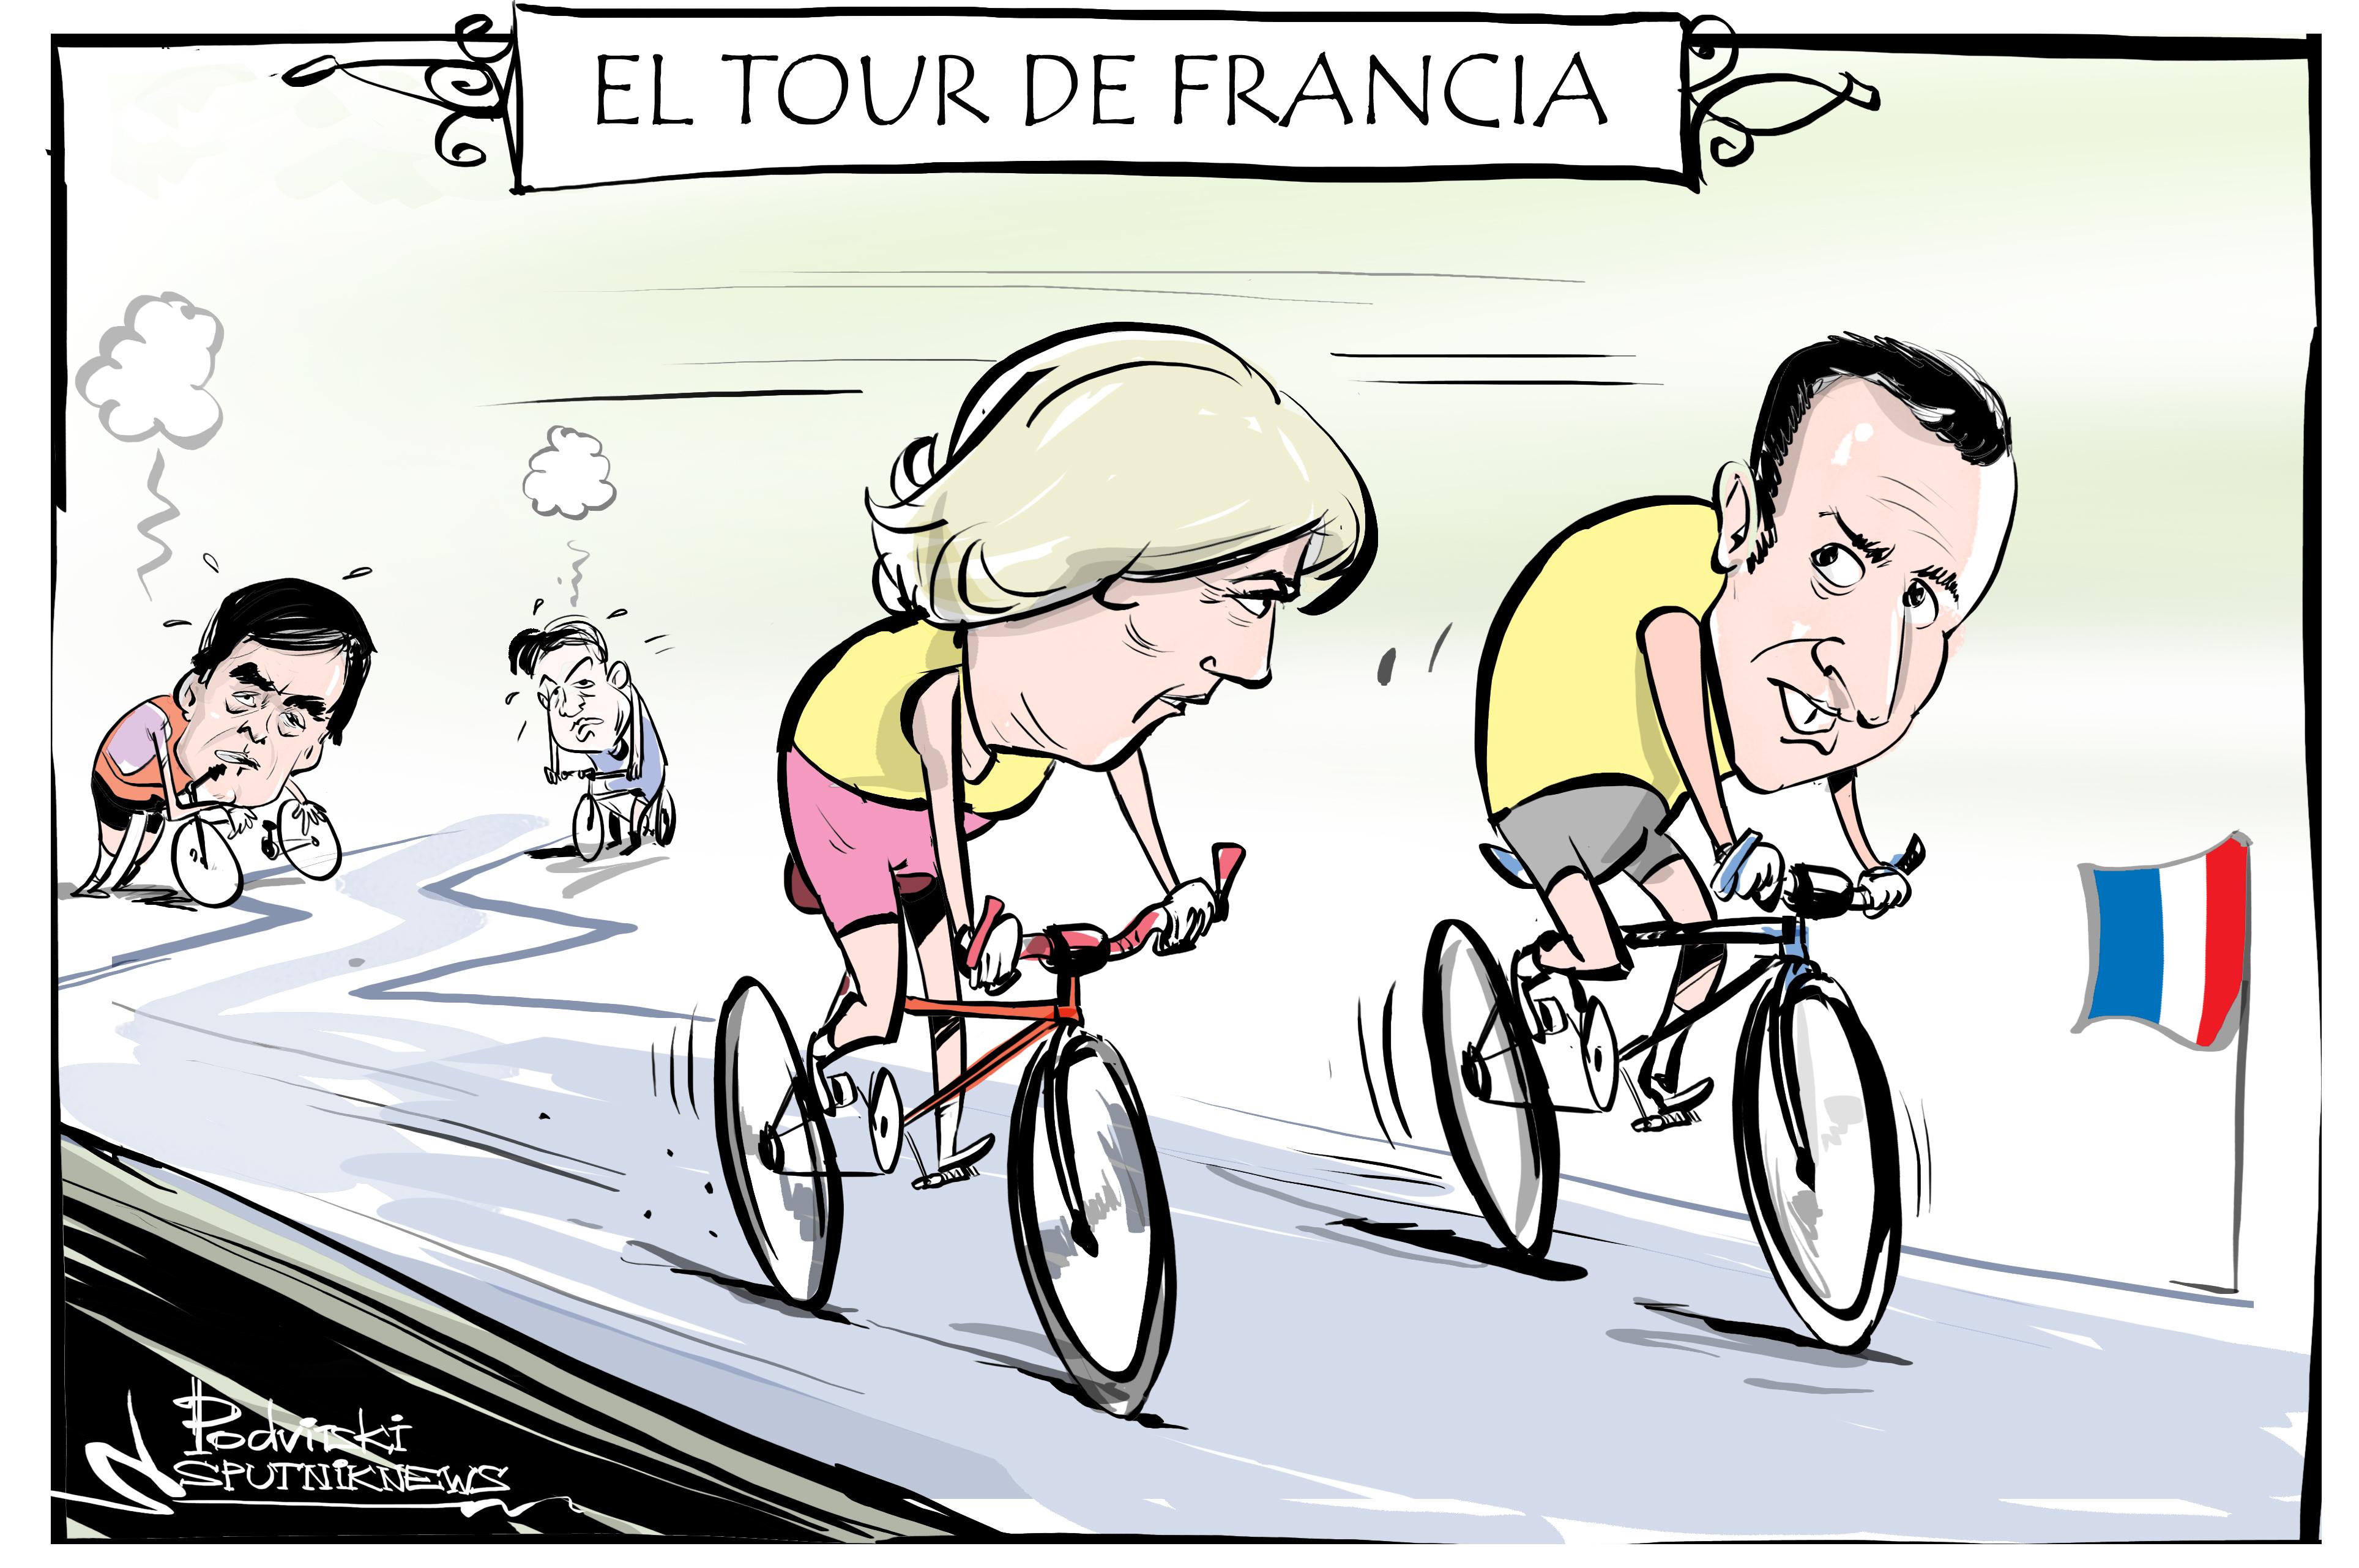 ¿Le Pen o Macron? El Tour de Francia se decidirá en la segunda etapa